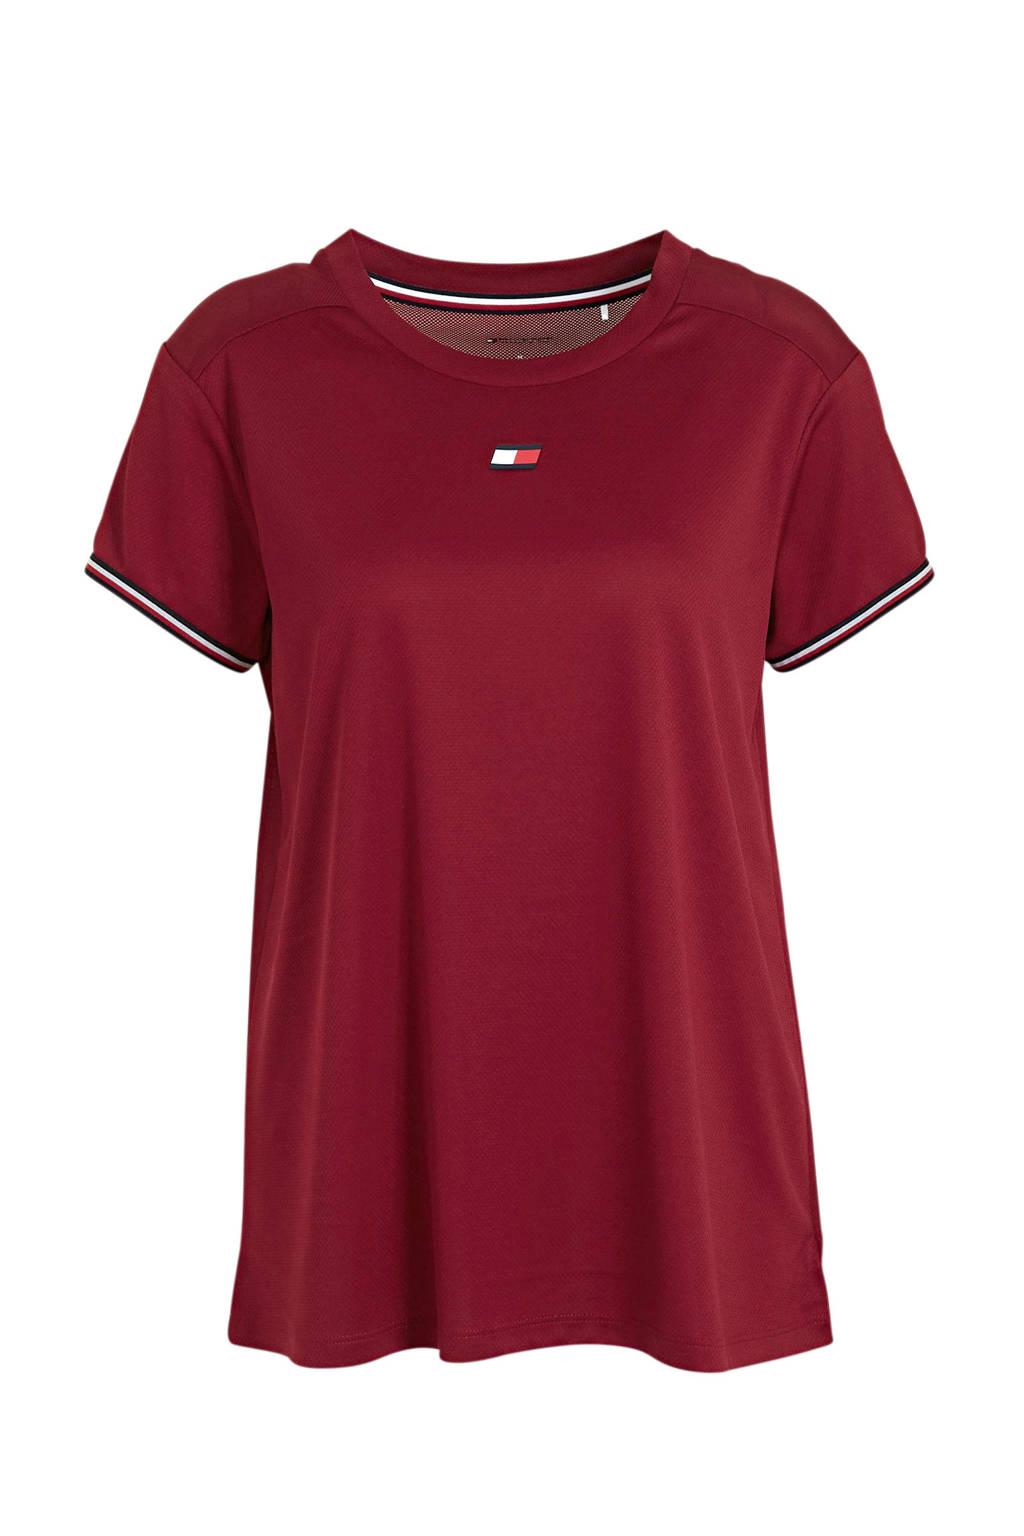 Tommy Hilfiger Sport sport T-shirt rood, Rood